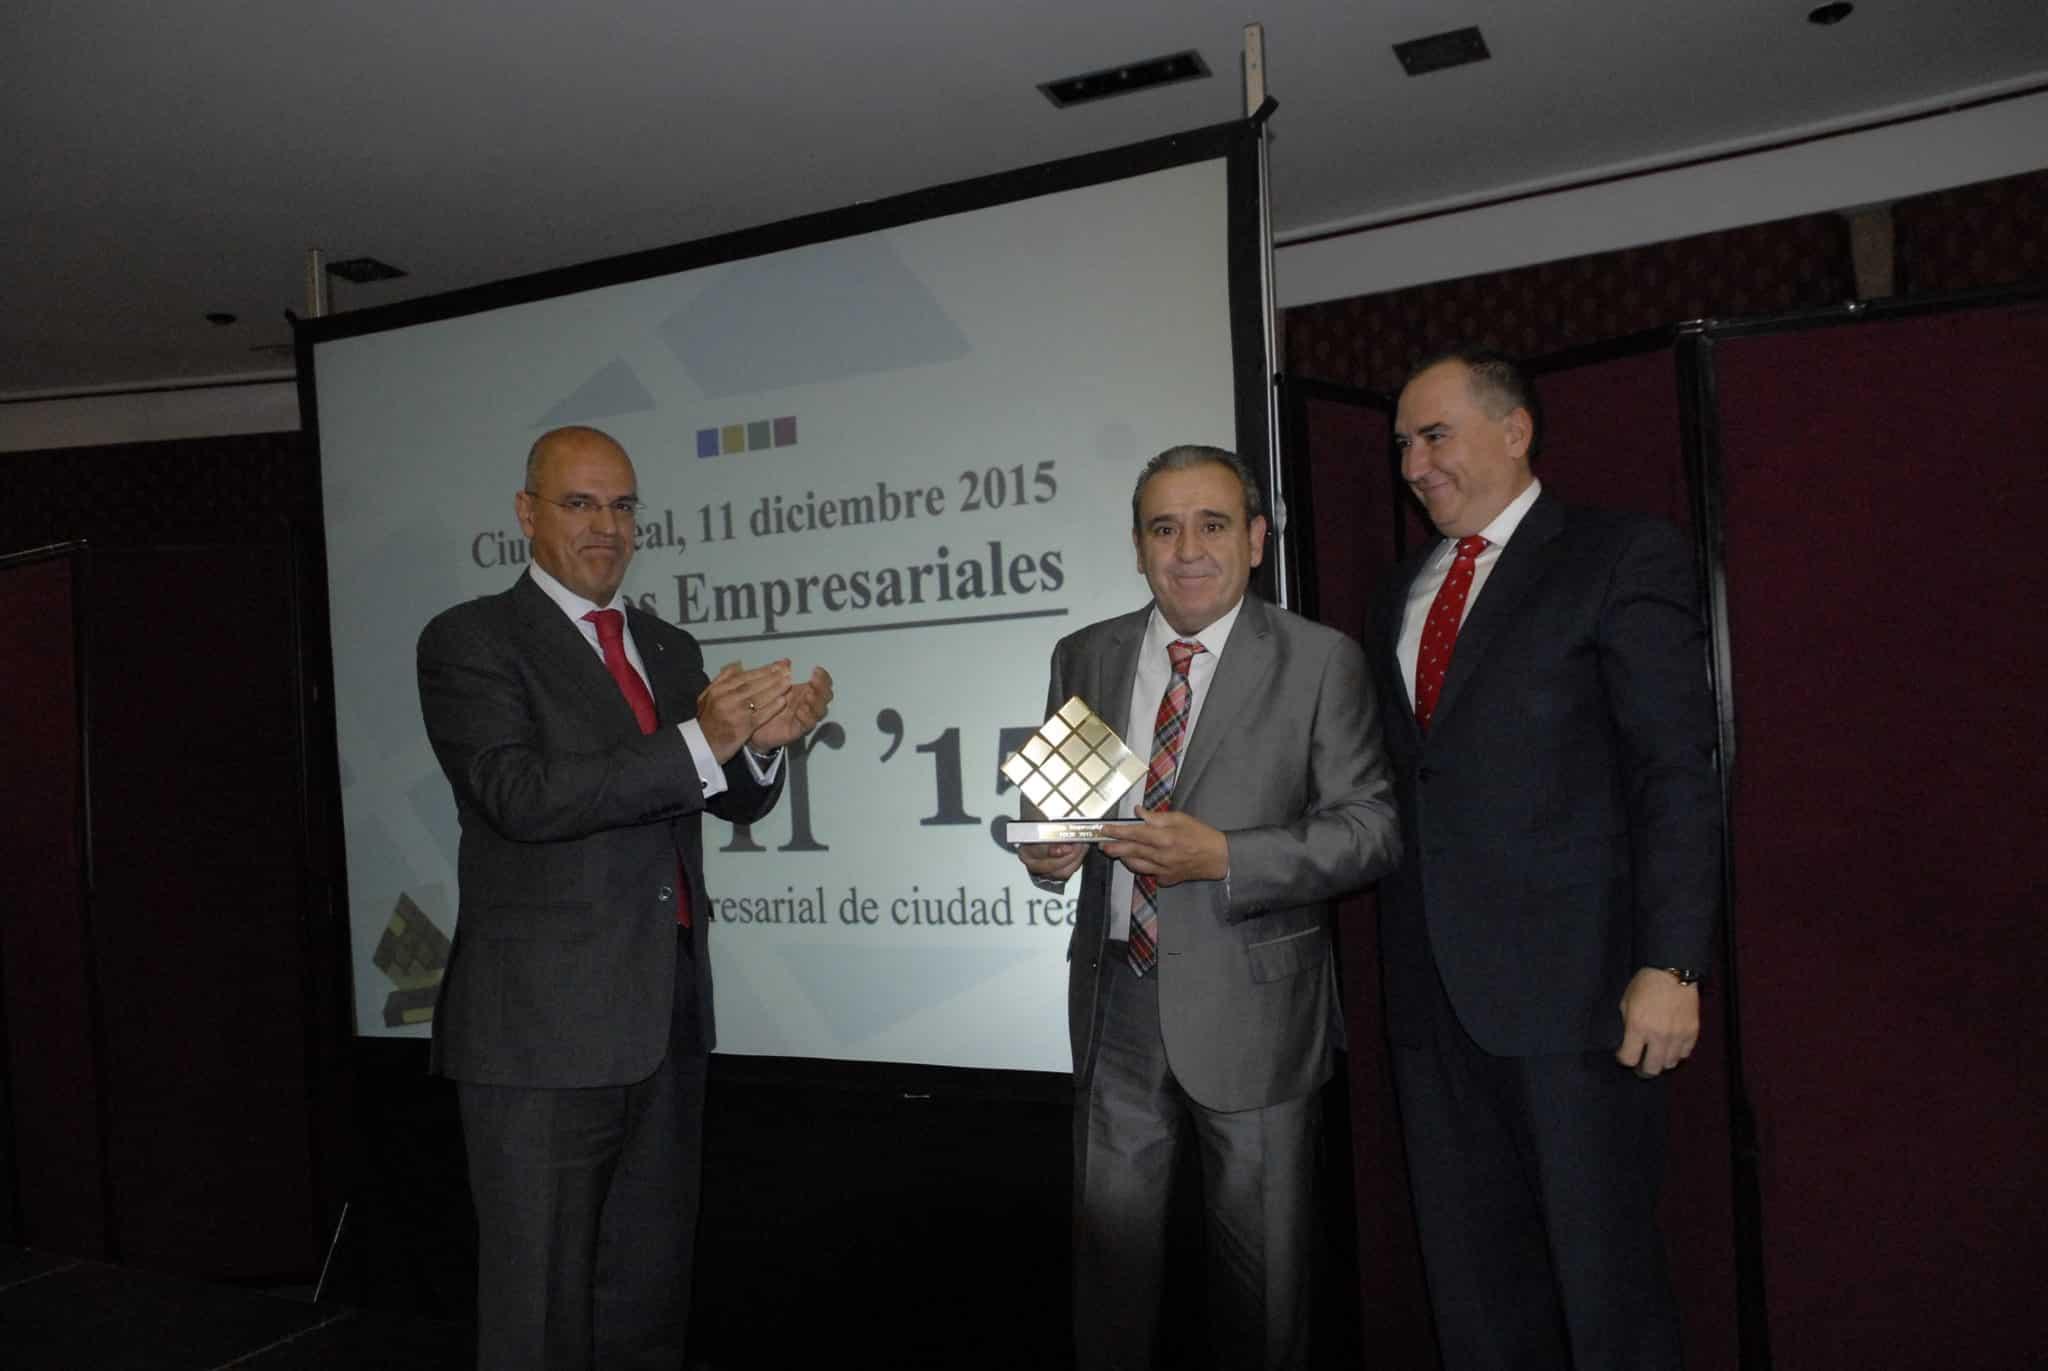 https://blog.globalcaja.es/wp-content/uploads/2015/12/globalcaja-fecir-premios-dic-2015-056.jpg